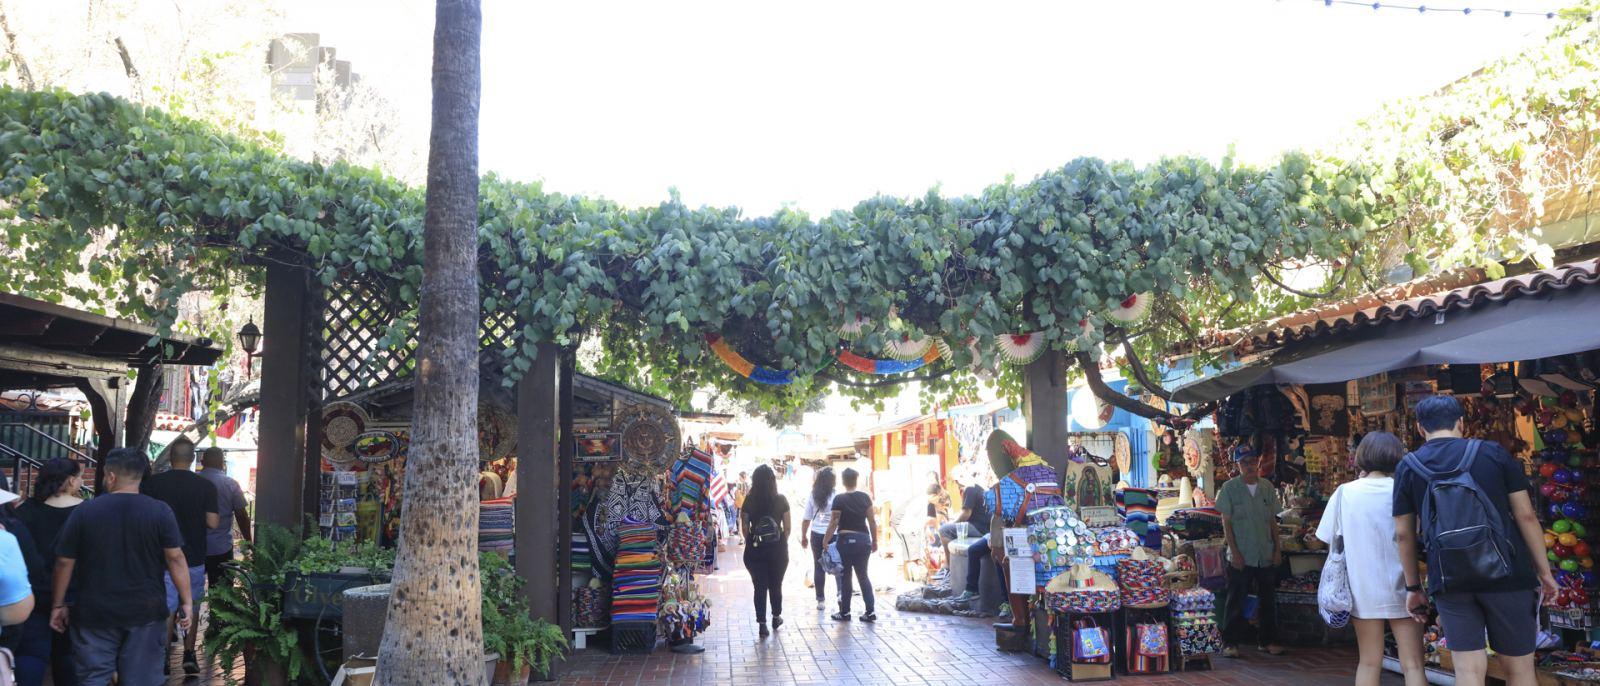 Olvera Street Vendors